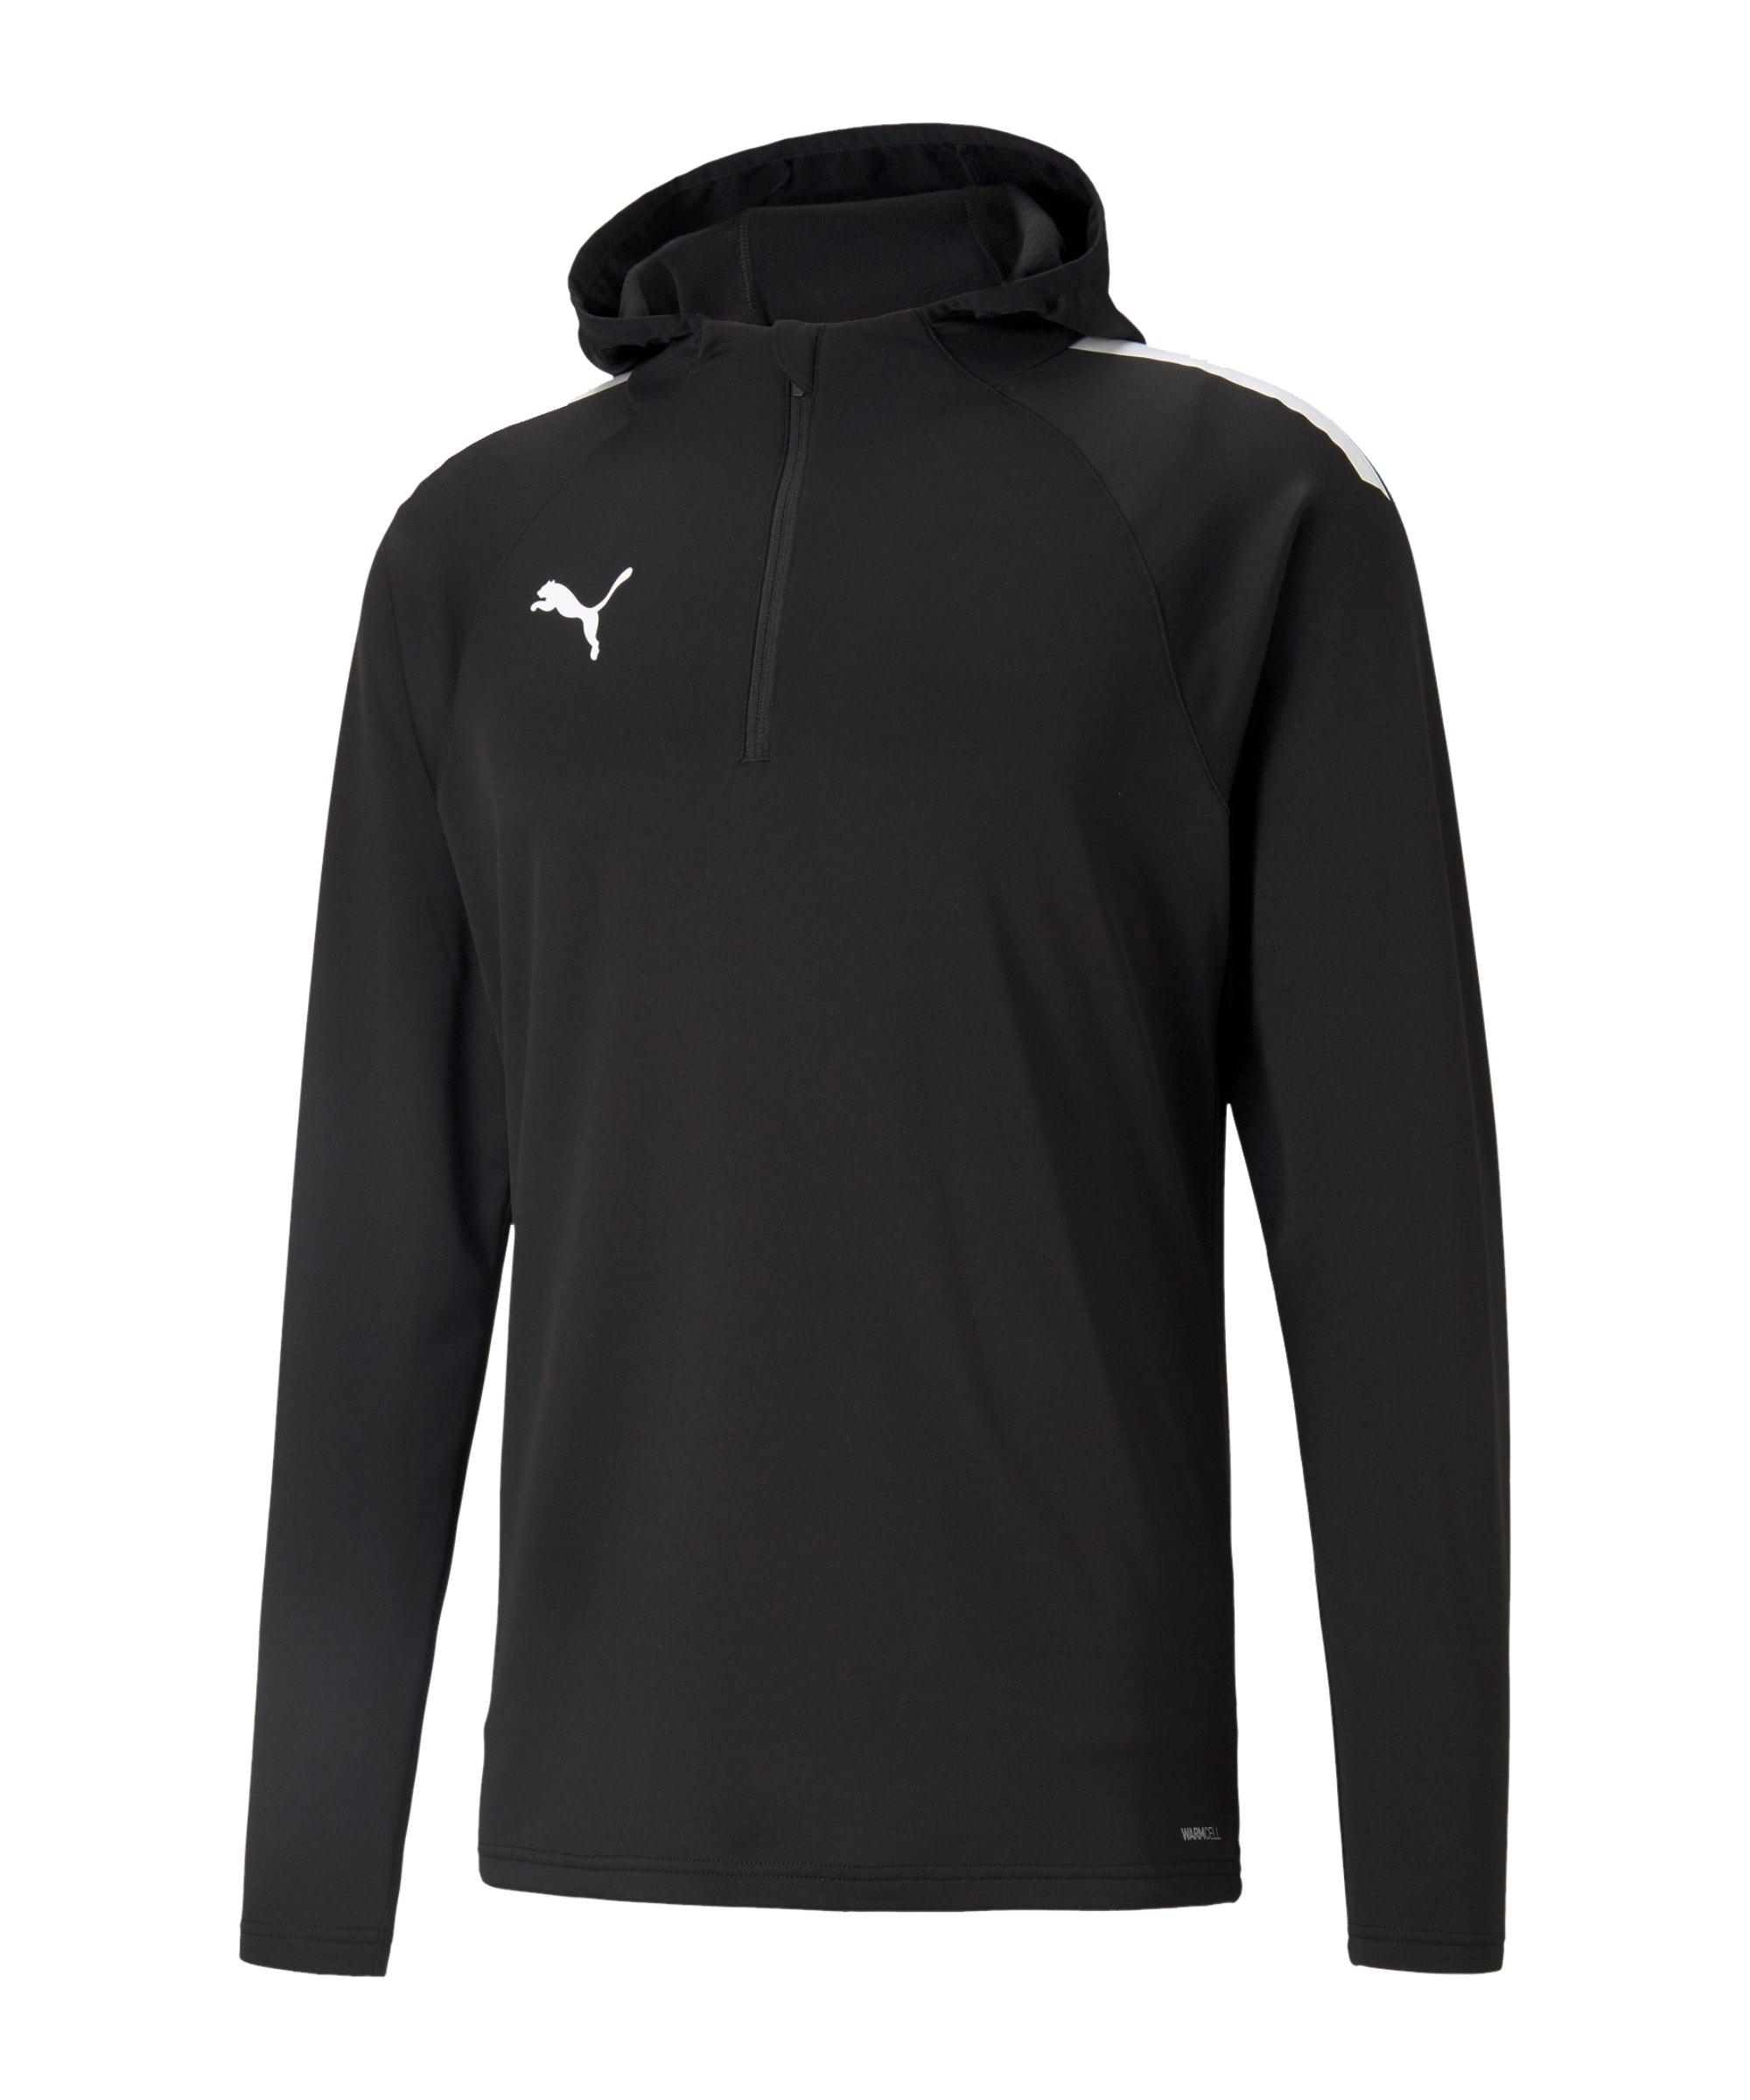 PUMA teamLIGA Fleece Sweatshirt Schwarz F03 - schwarz